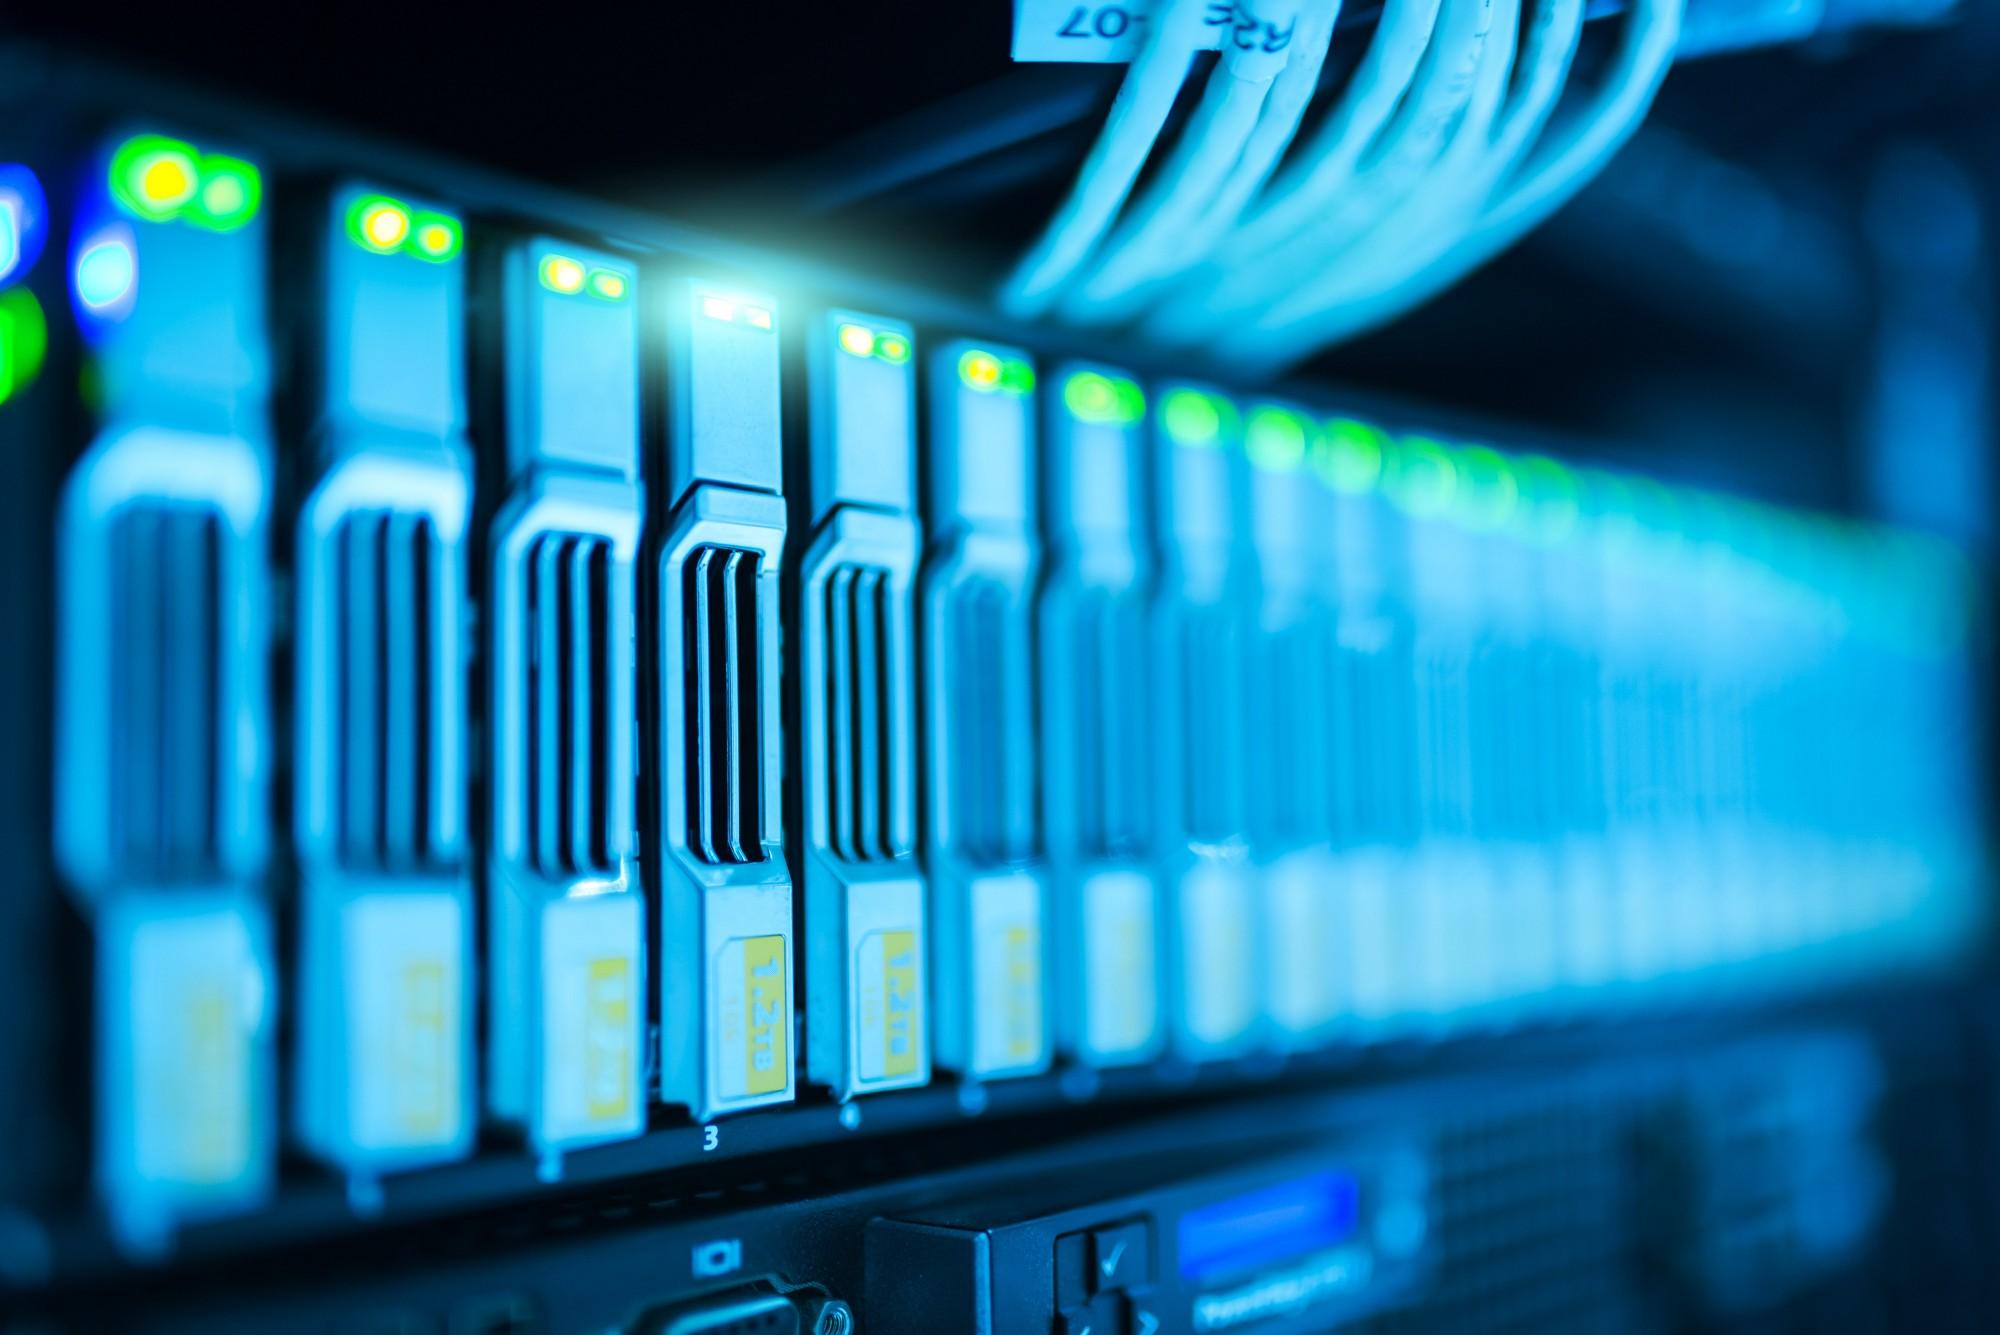 Cloud Computing for Data Warehousing